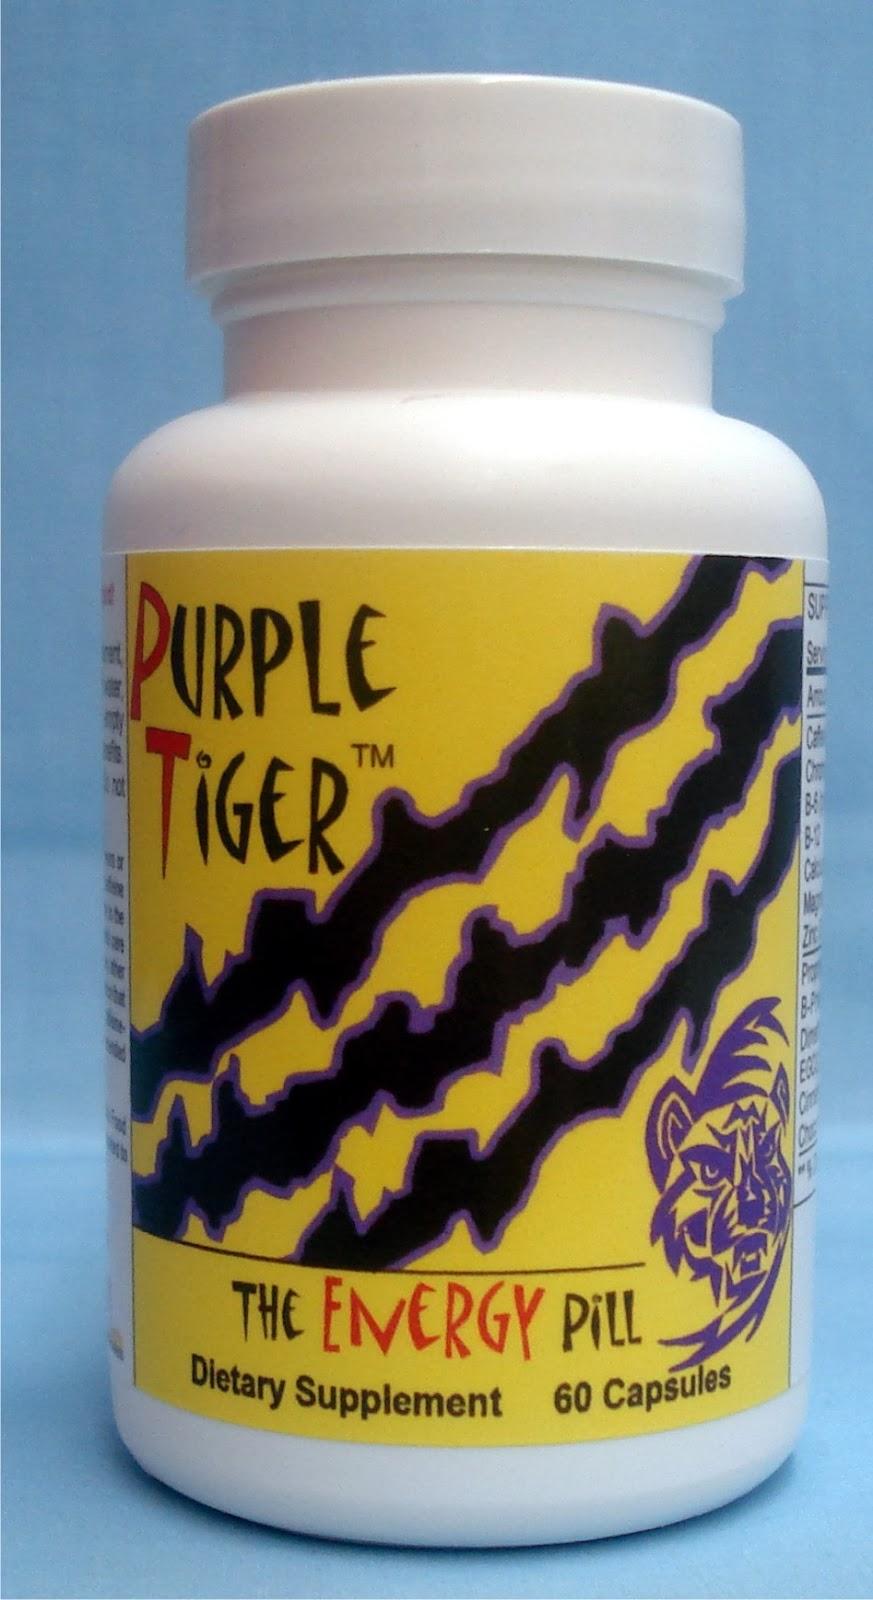 Purple Tiger Stargazer Nail Art Designs By Top Nails: My Vista Health Products: My Purple Tiger Success Update